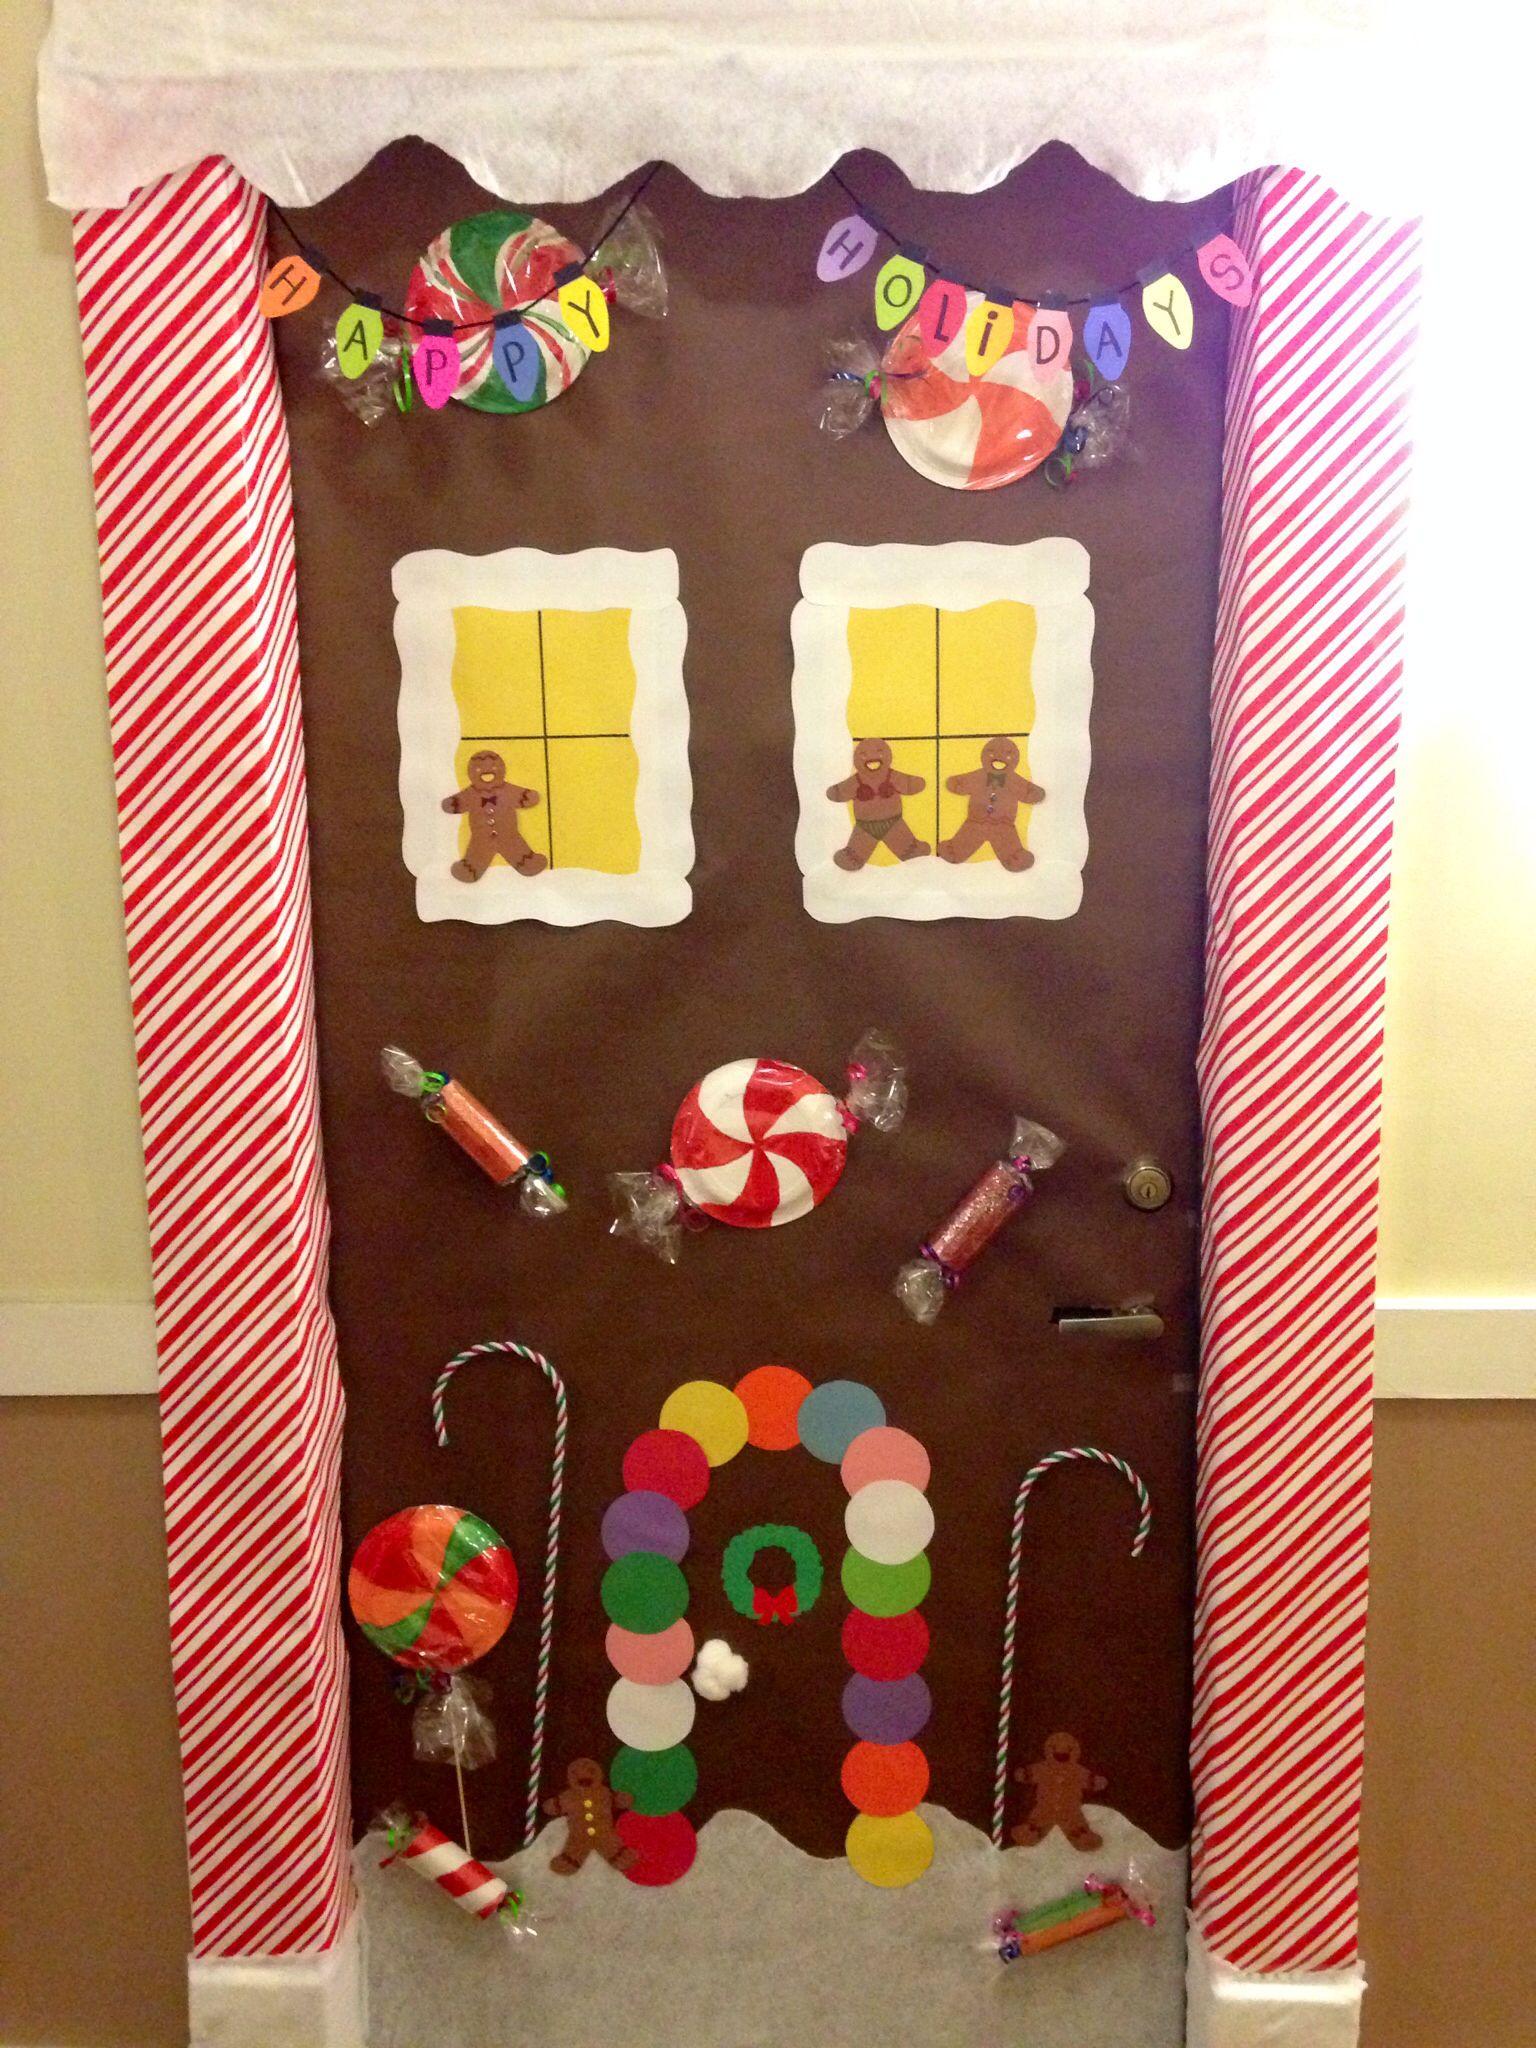 Gingerbread House Door Decor & Gingerbread House Door Decor | Holidays stuff | Pinterest | House ...